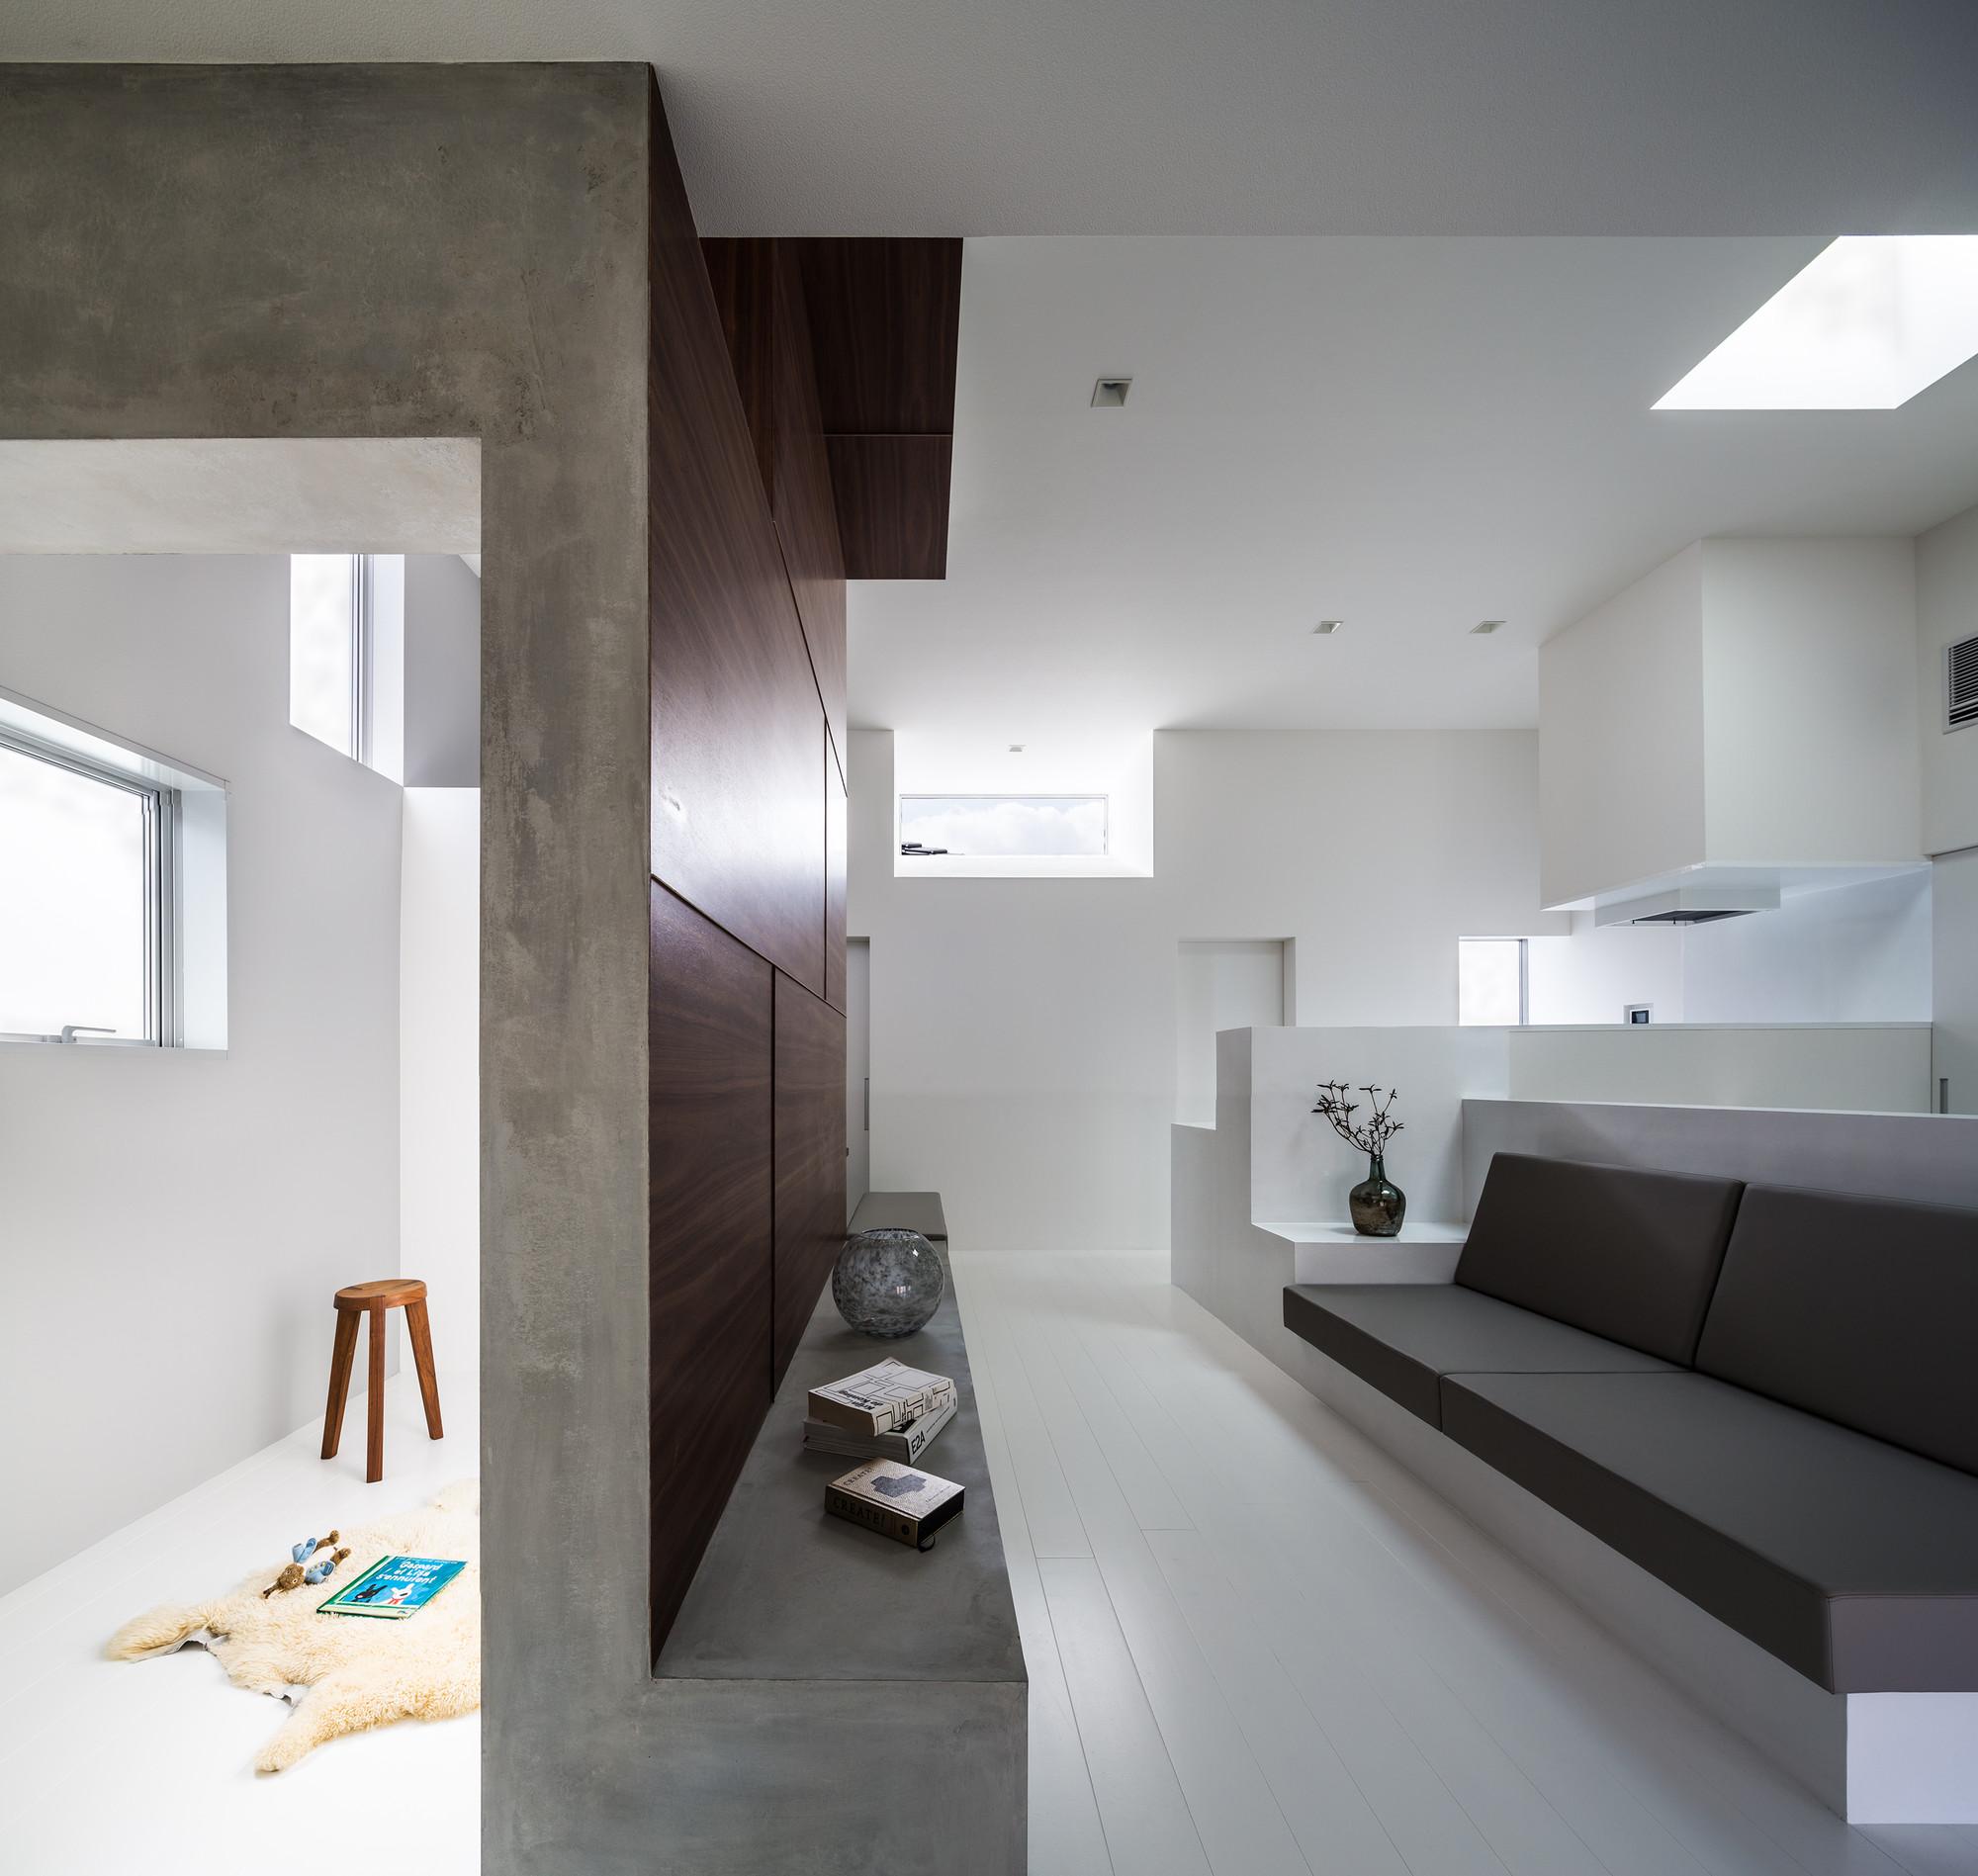 Casa Cozy / FORM | Kouichi Kimura Architects, © Yoshihiro Asada